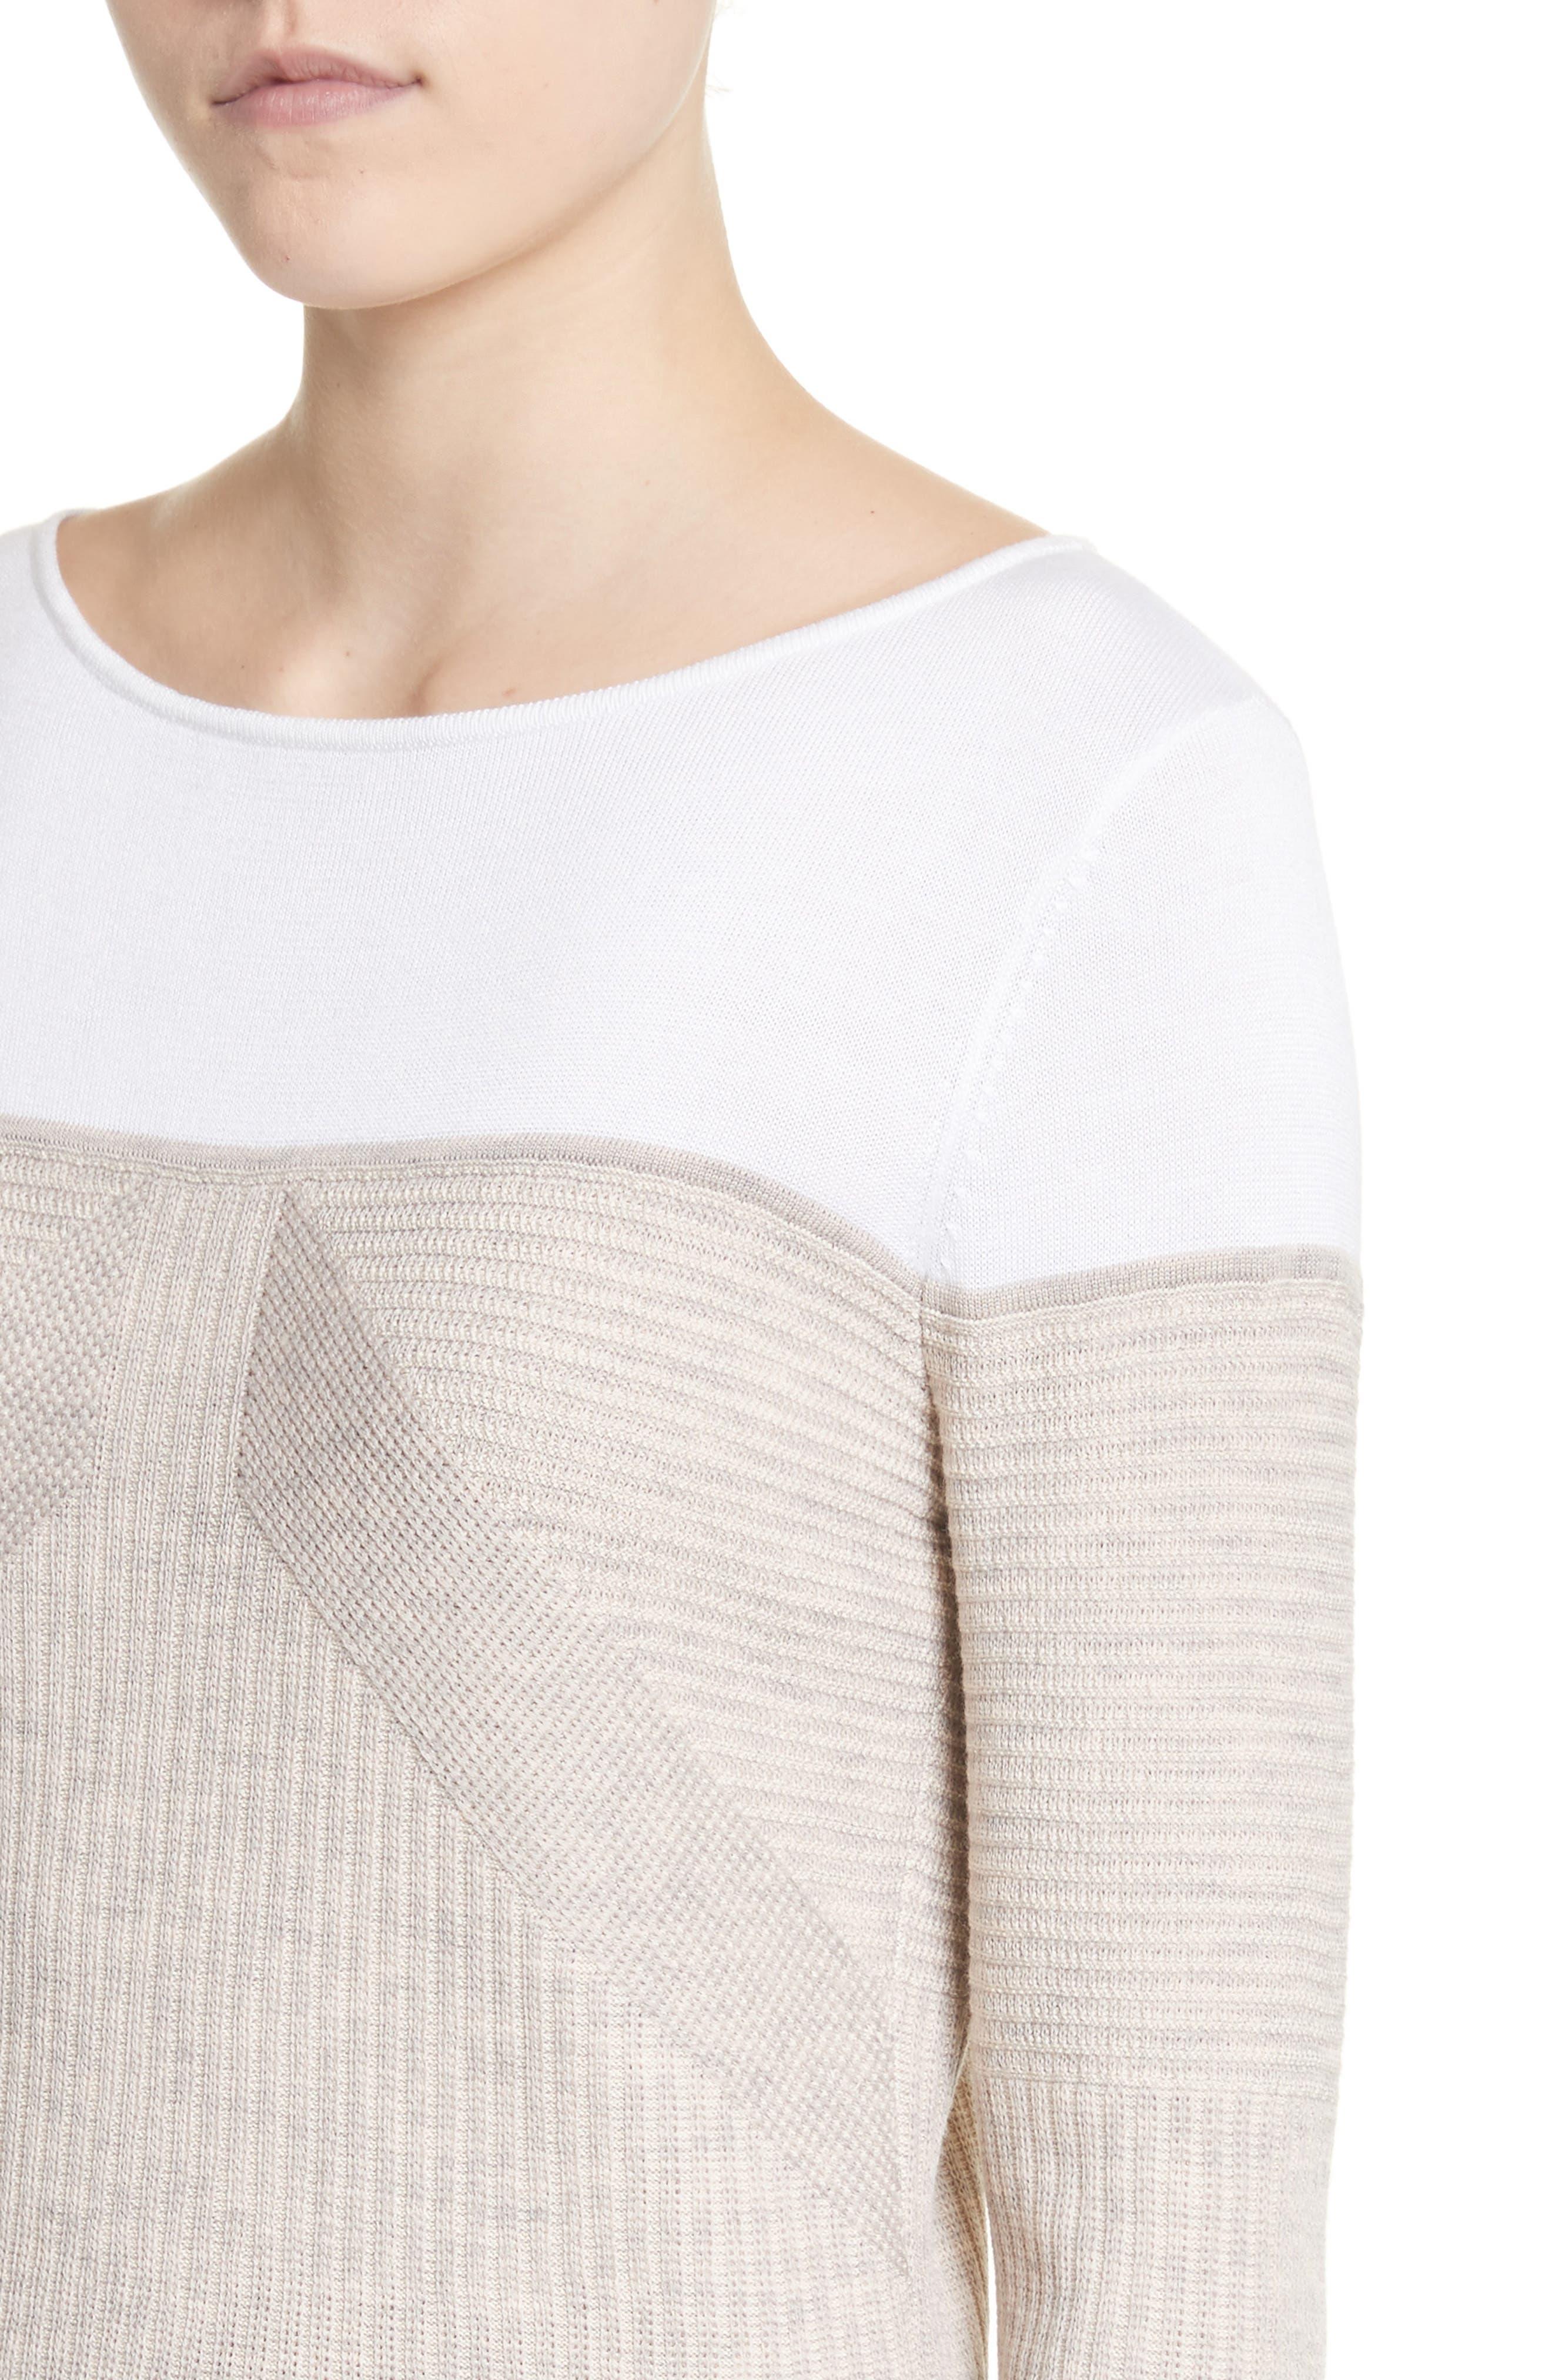 Tech Rib Knit Sweater,                             Alternate thumbnail 4, color,                             200